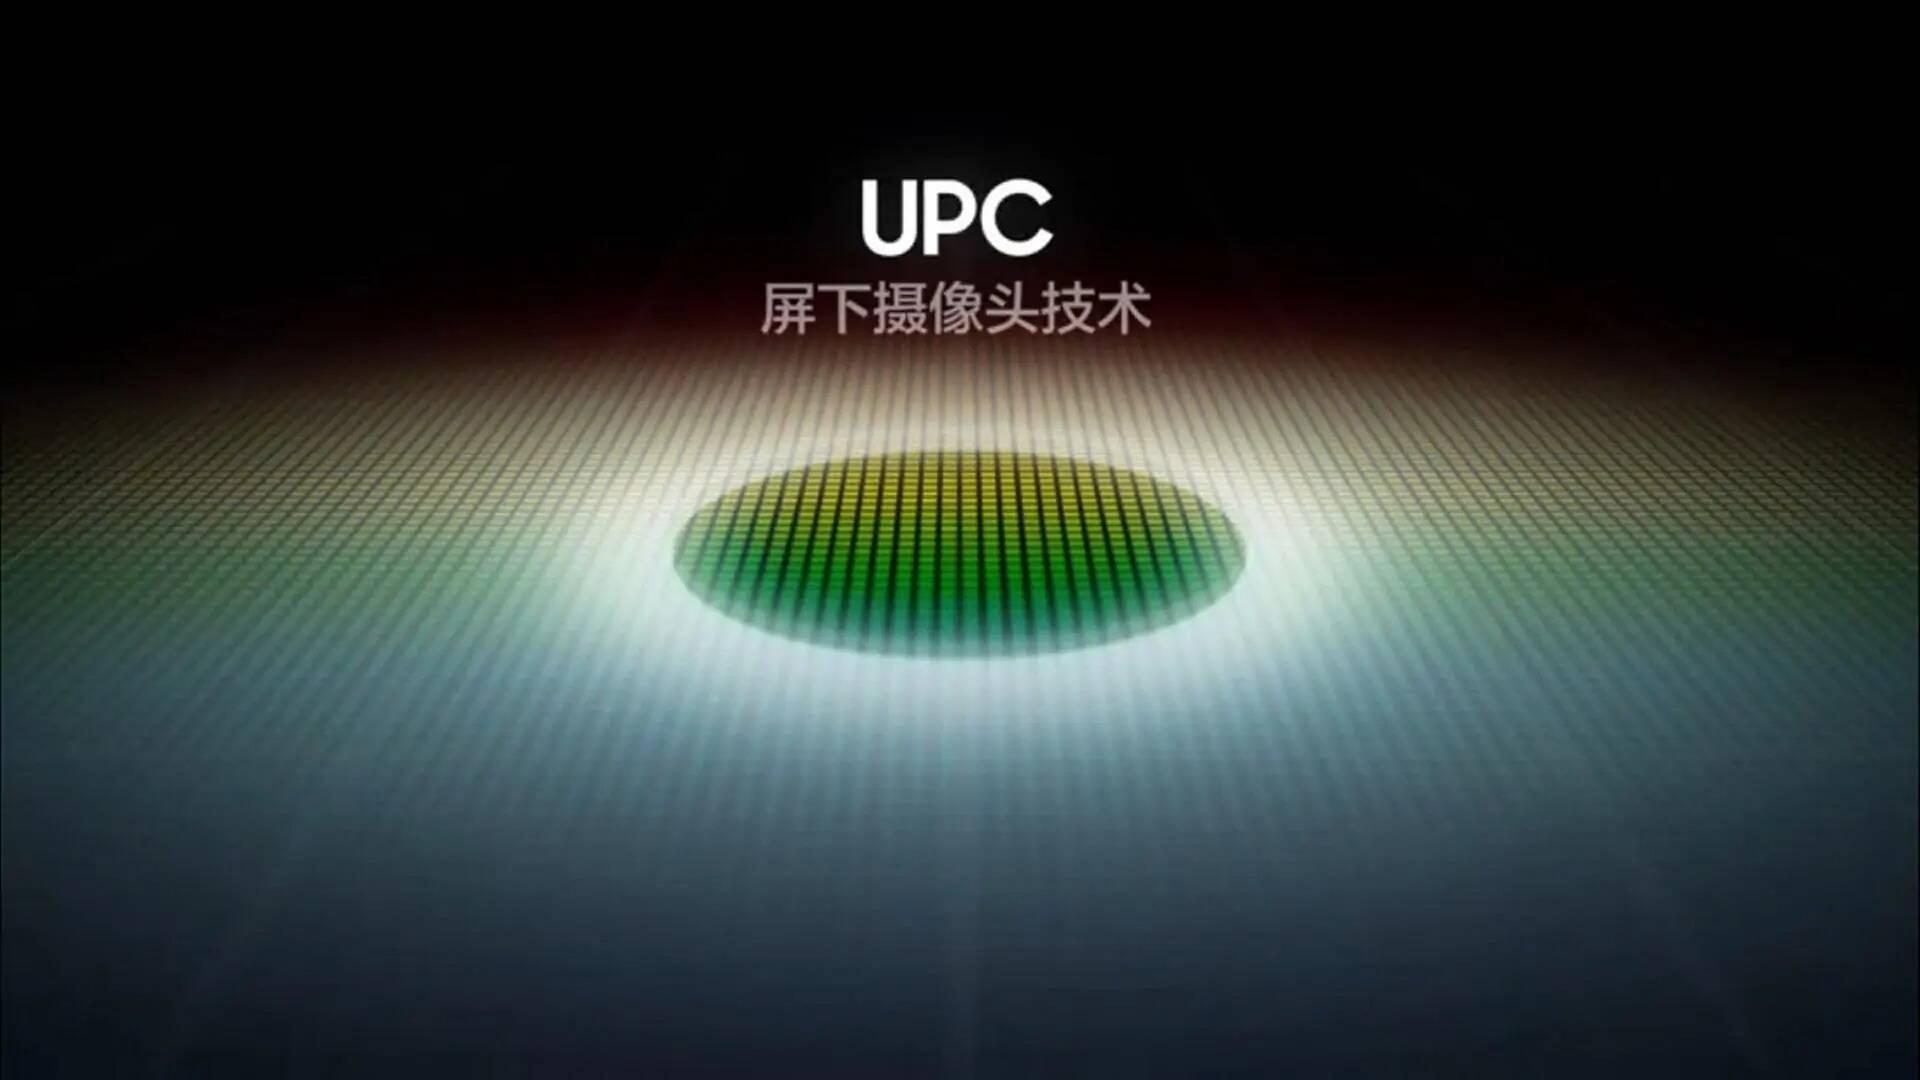 Samsung UPC fotocamera sotto display